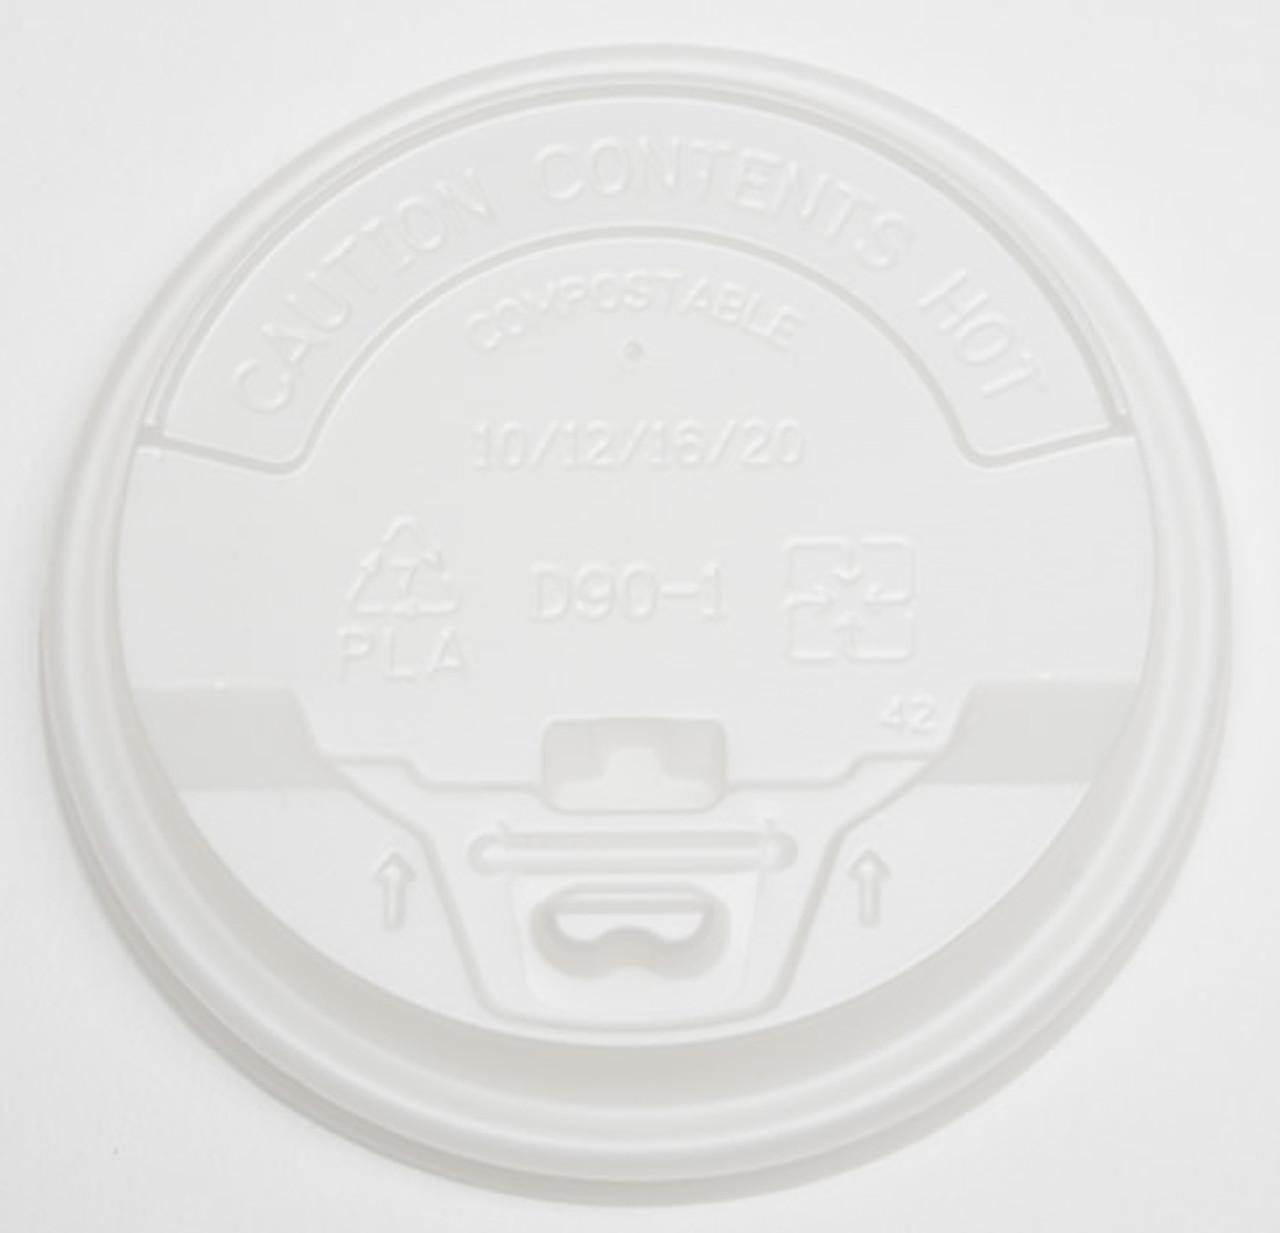 90mm cPLA Flip Top Lid, Fits 10oz/12oz/16oz/20oz Coffee Cups